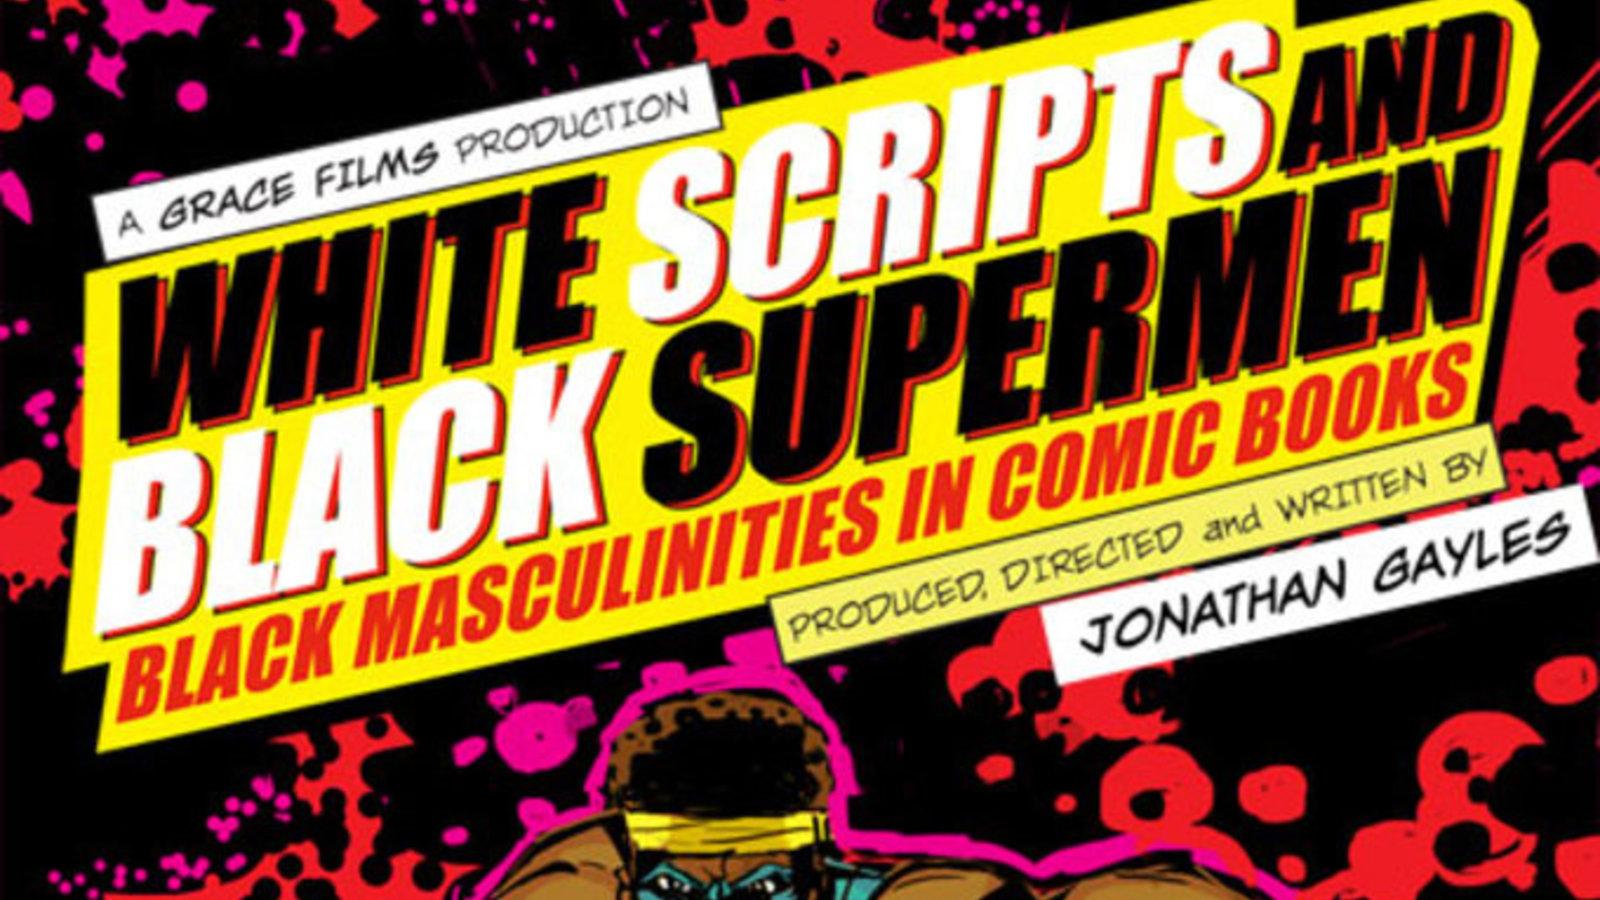 White Scripts And Black Supermen - Black Masculinities in Comic Books